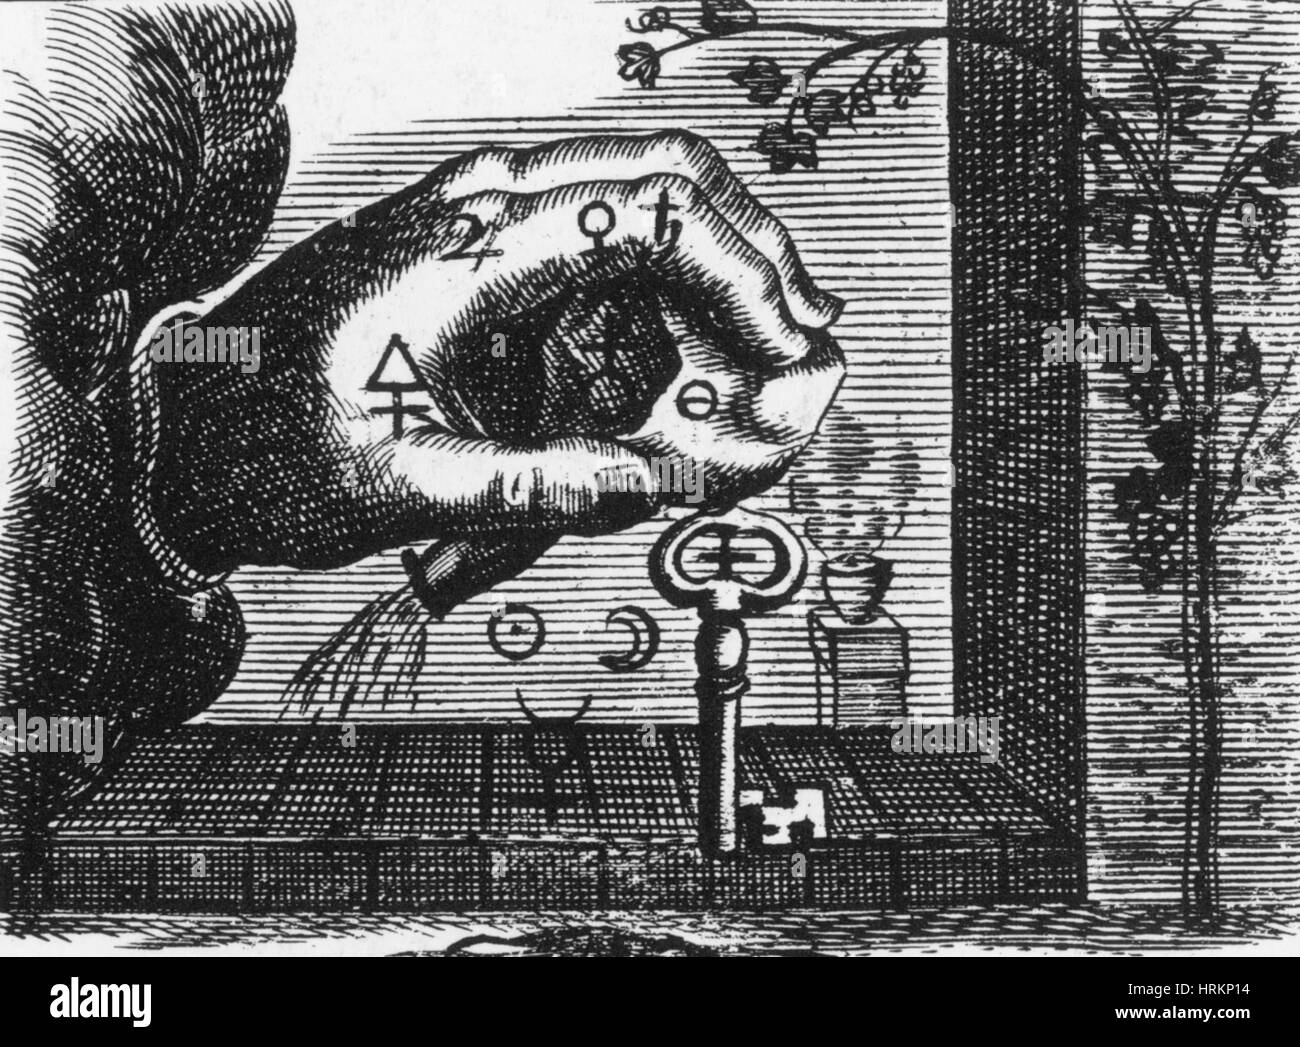 Alchemy Illustration - Stock Image